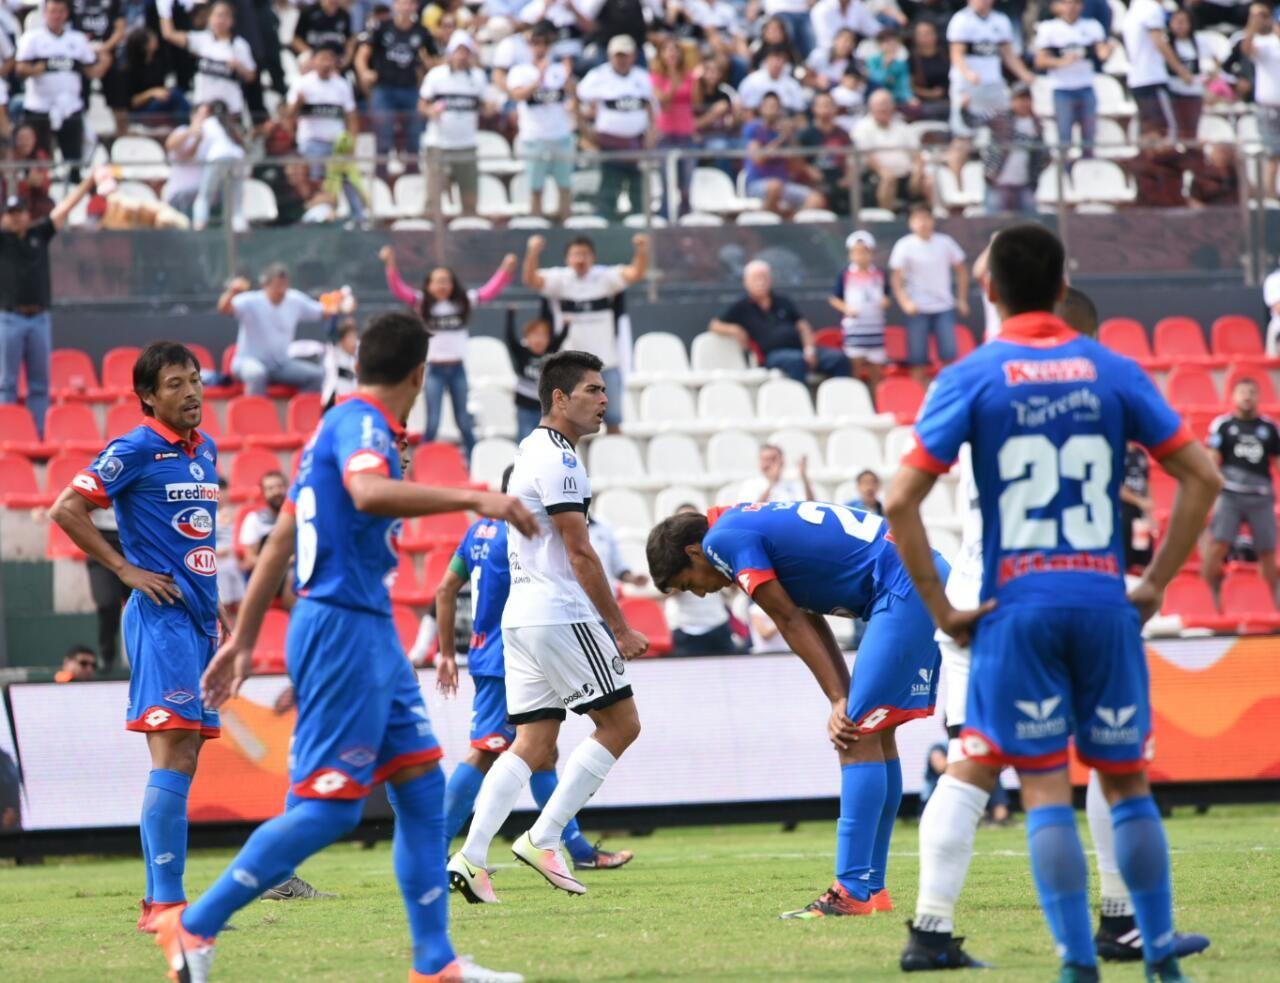 Olimpia e Independiente cerrarán la primera fecha del Apertura. Foto: Raúl Cañete-Última Hora